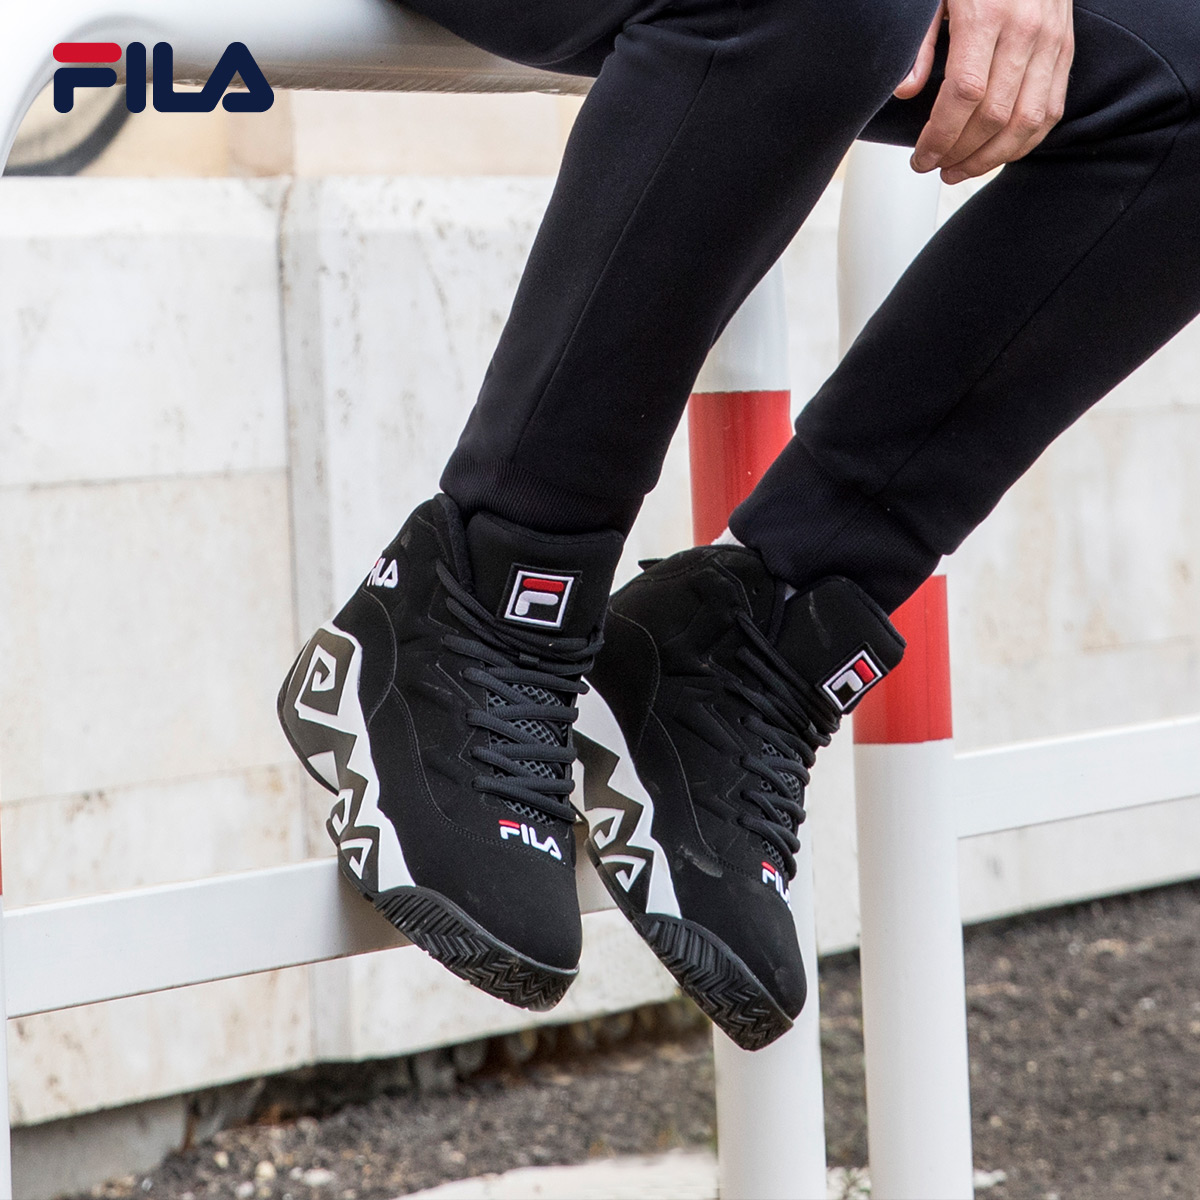 880bf2ad2d25 FILA Fila BB shoes men s shoes Winter new Star models tide shoes casual  shoes basketball shoes men